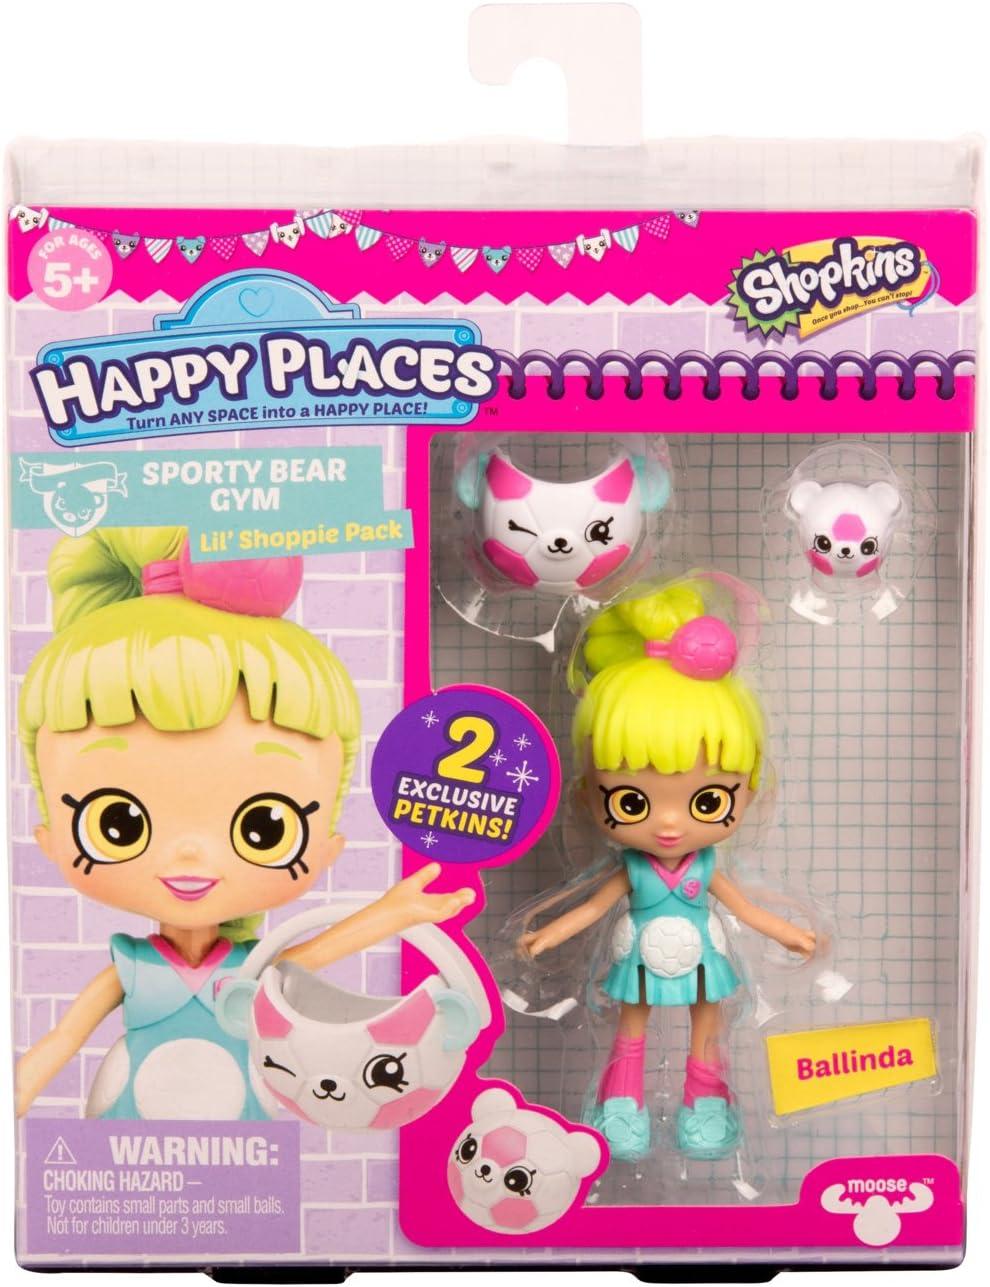 Shopkins Happy Places Doll Single Pack - Ballinda